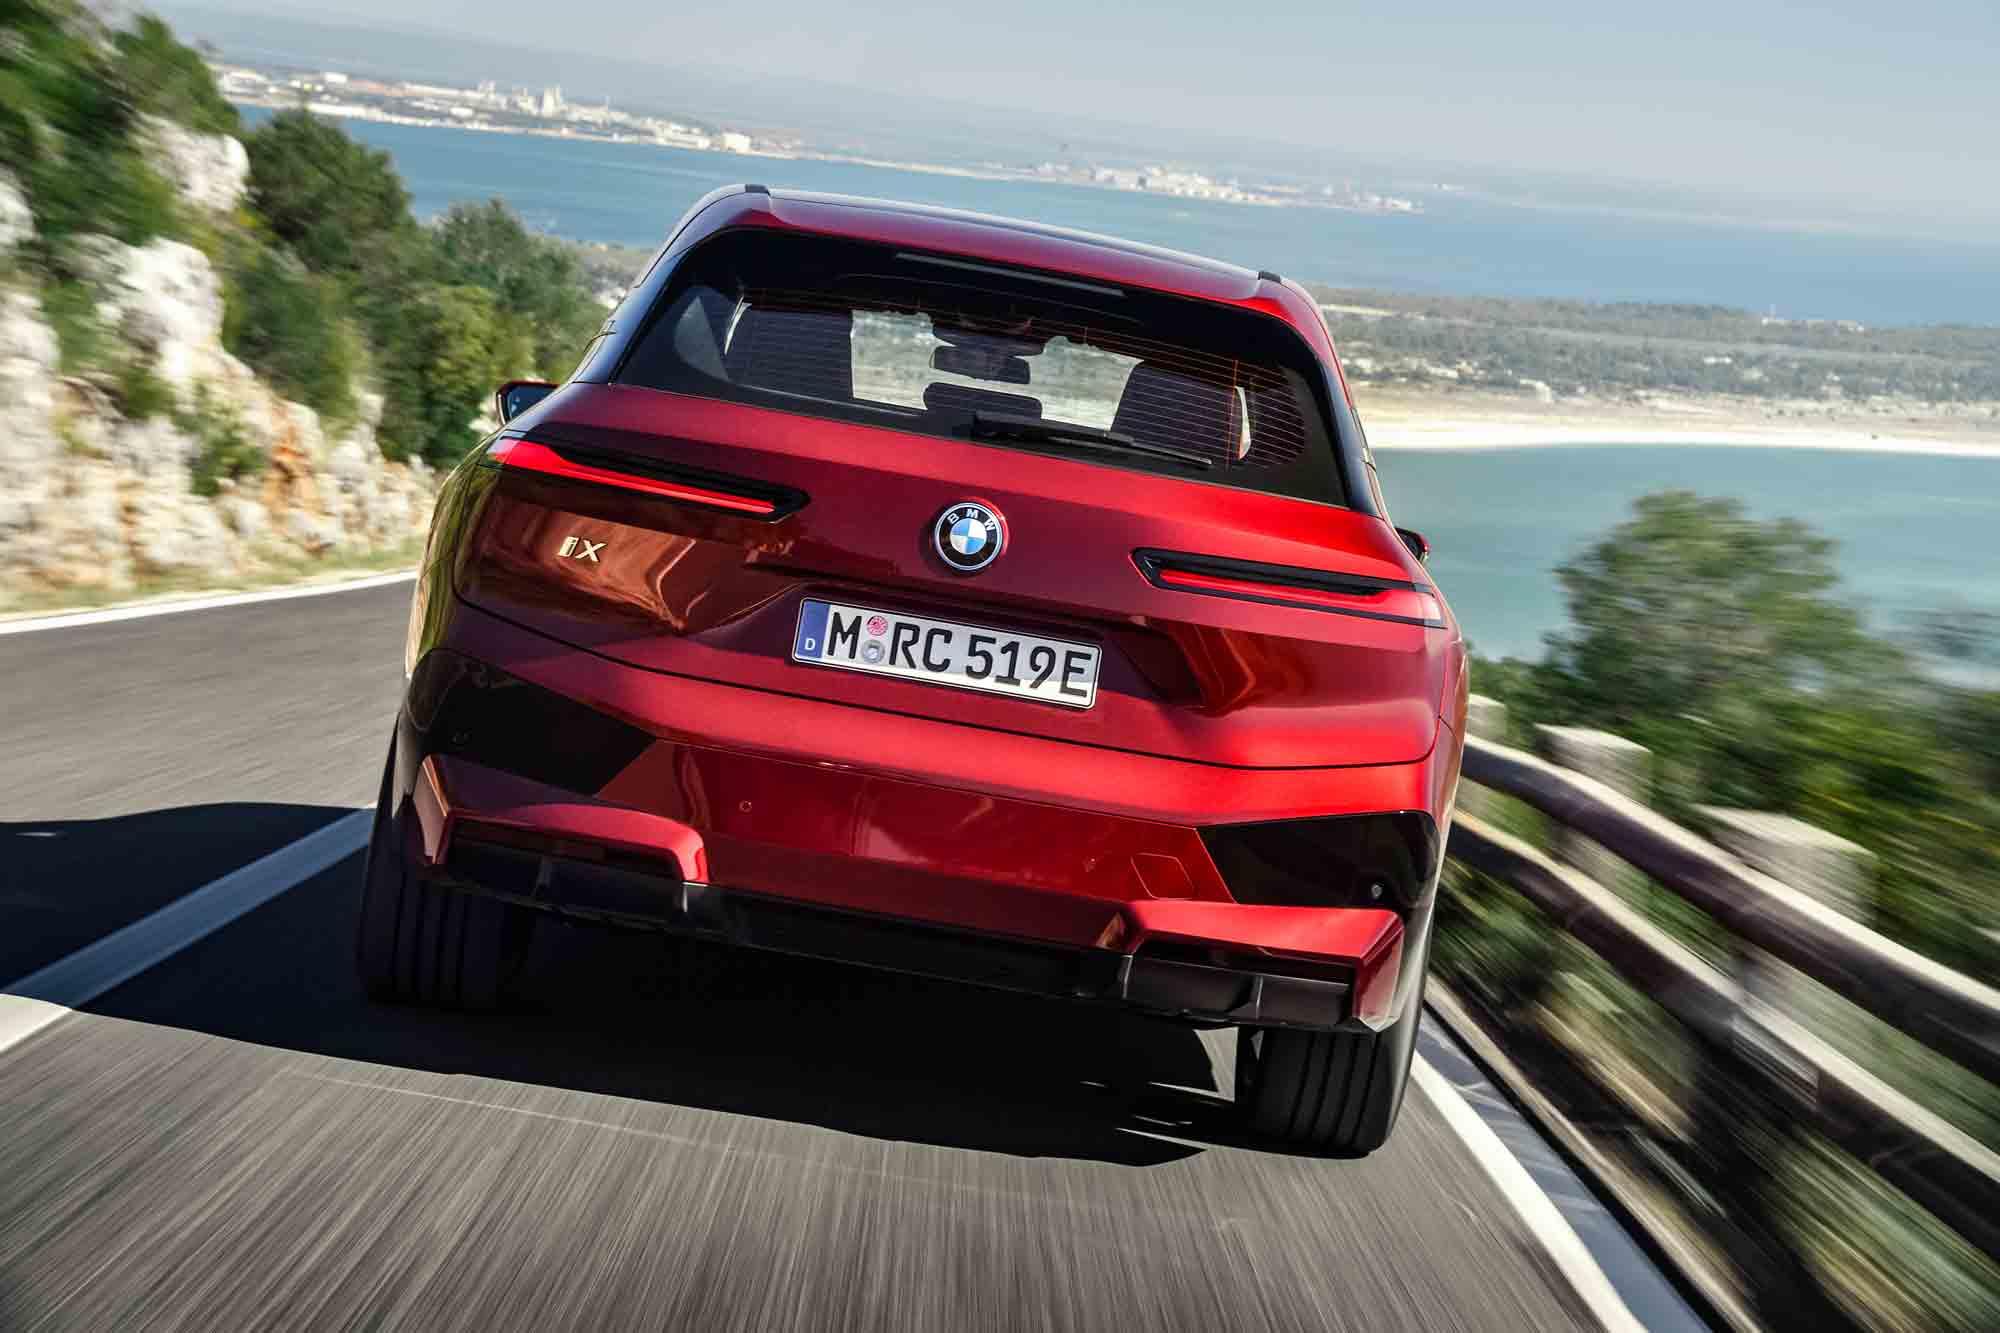 Retro BMW iX